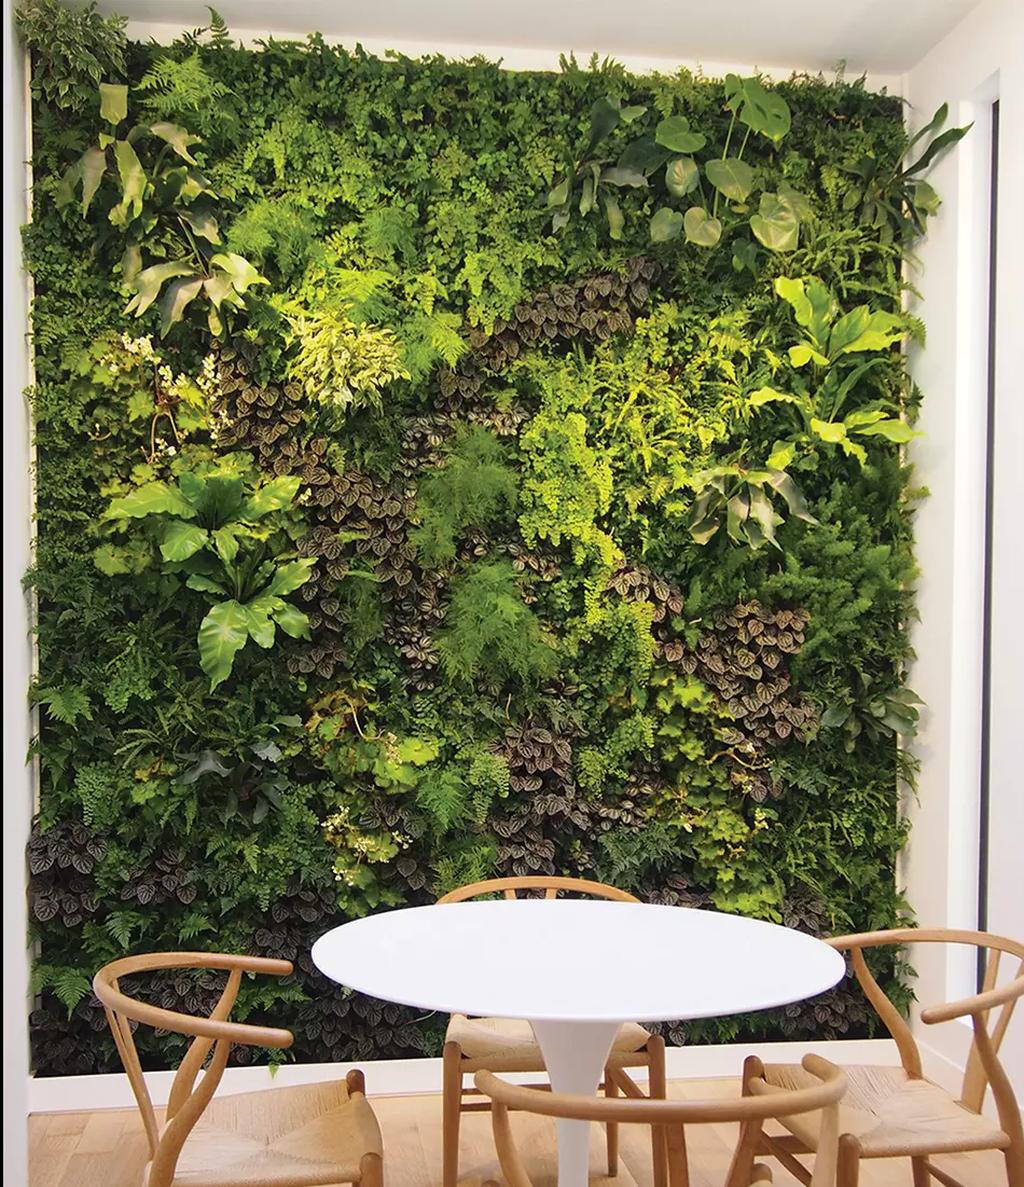 Popular Vertical Garden Wall For Outdoors Decor 02